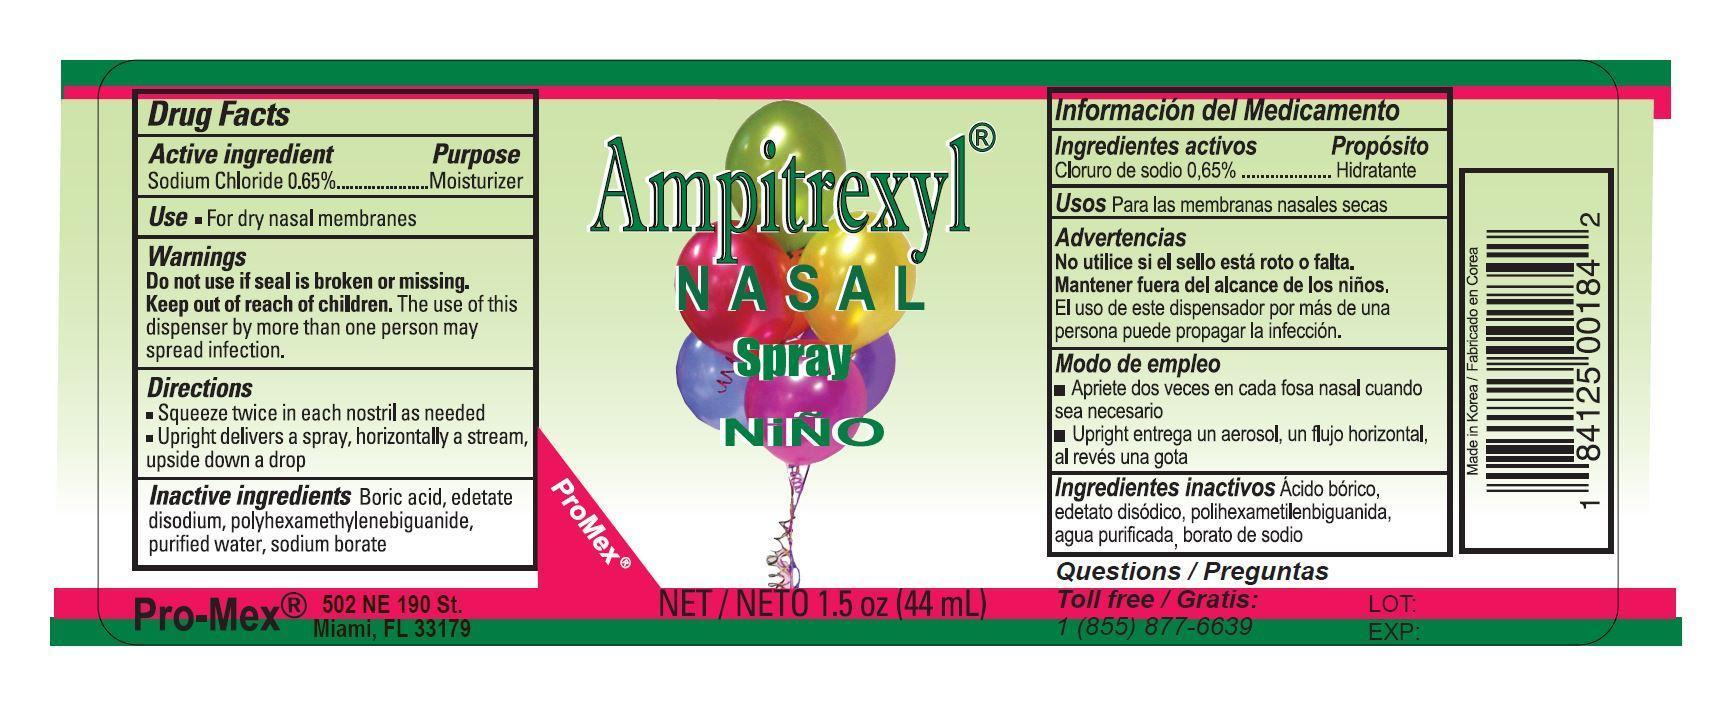 Saline Nasal (Sodium Chloride) Spray [Promex, Llc]